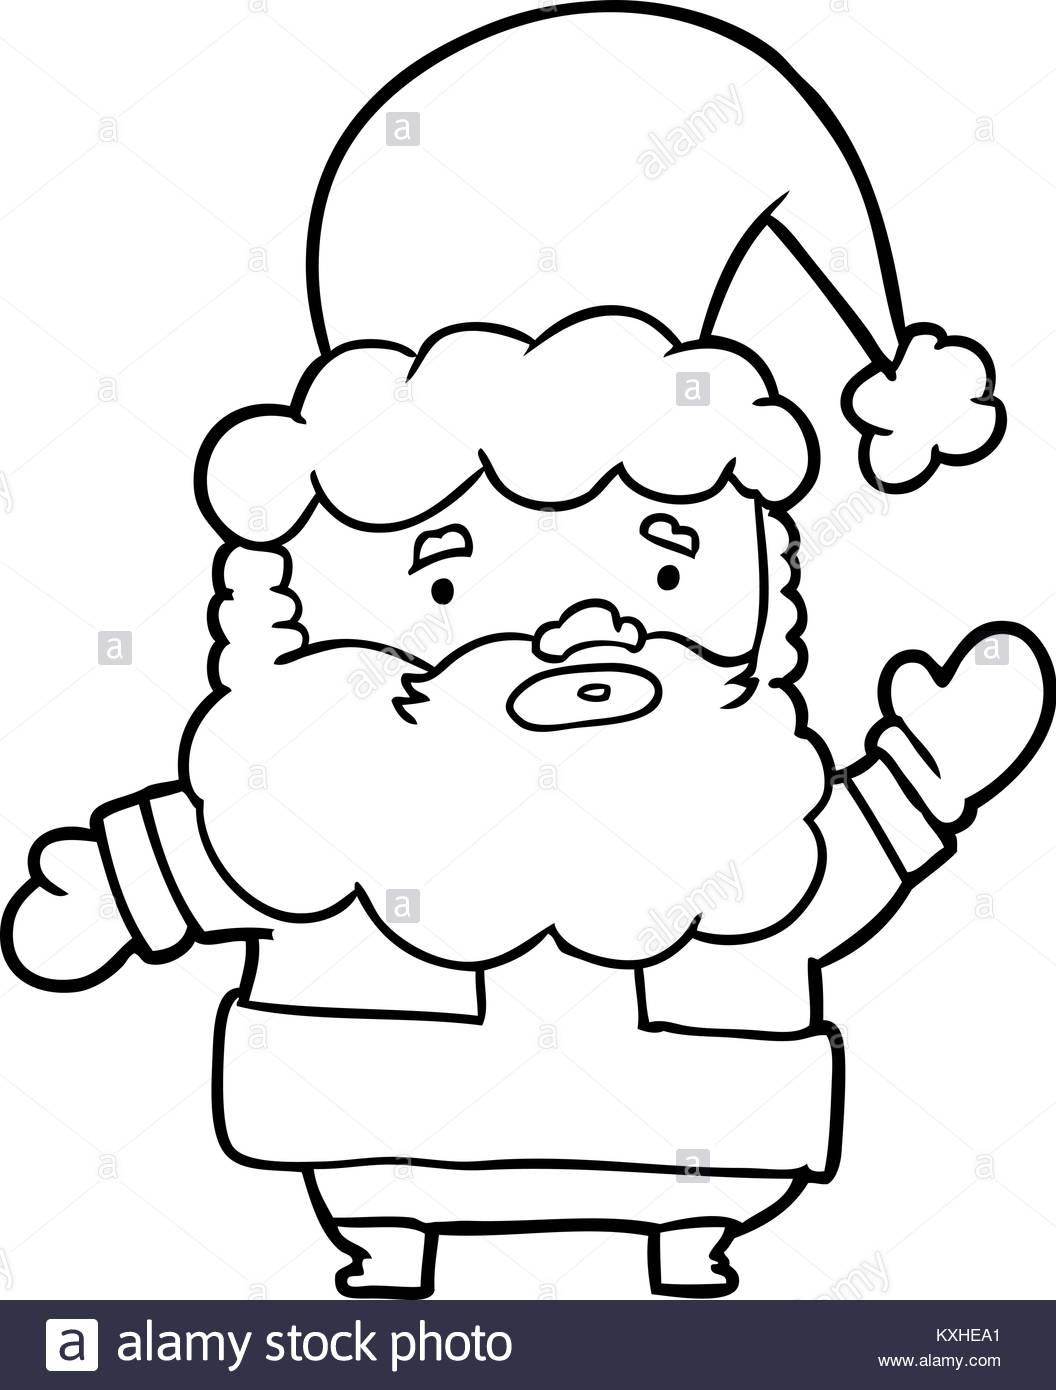 1056x1390 Line Drawing Of A Santa Claus Waving Stock Vector Art